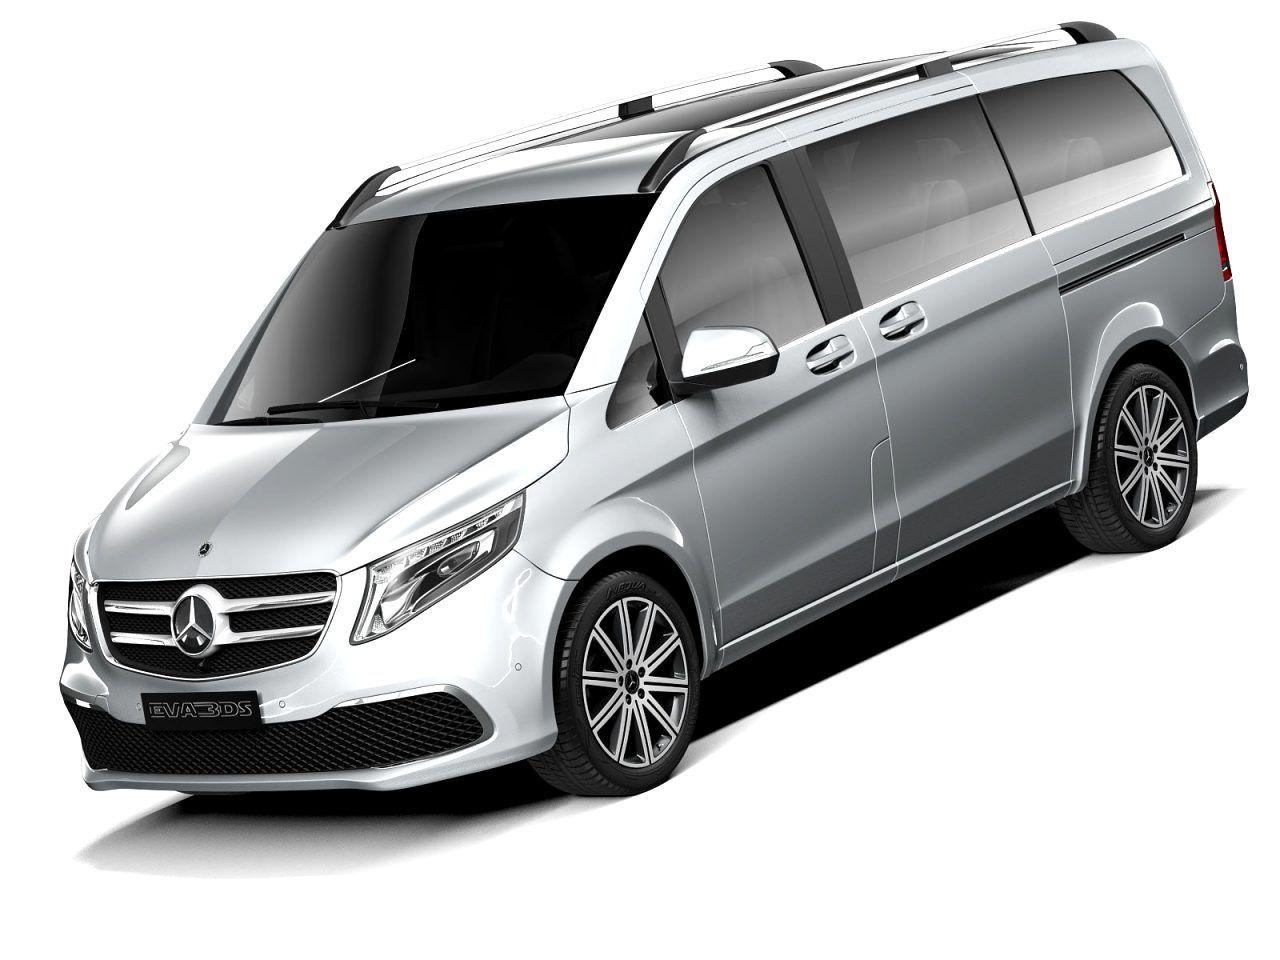 Mercedes Viano 2021 Exterior And Interior In 2021 Mercedes Benz Vito Toyota Suv Jaguar Suv